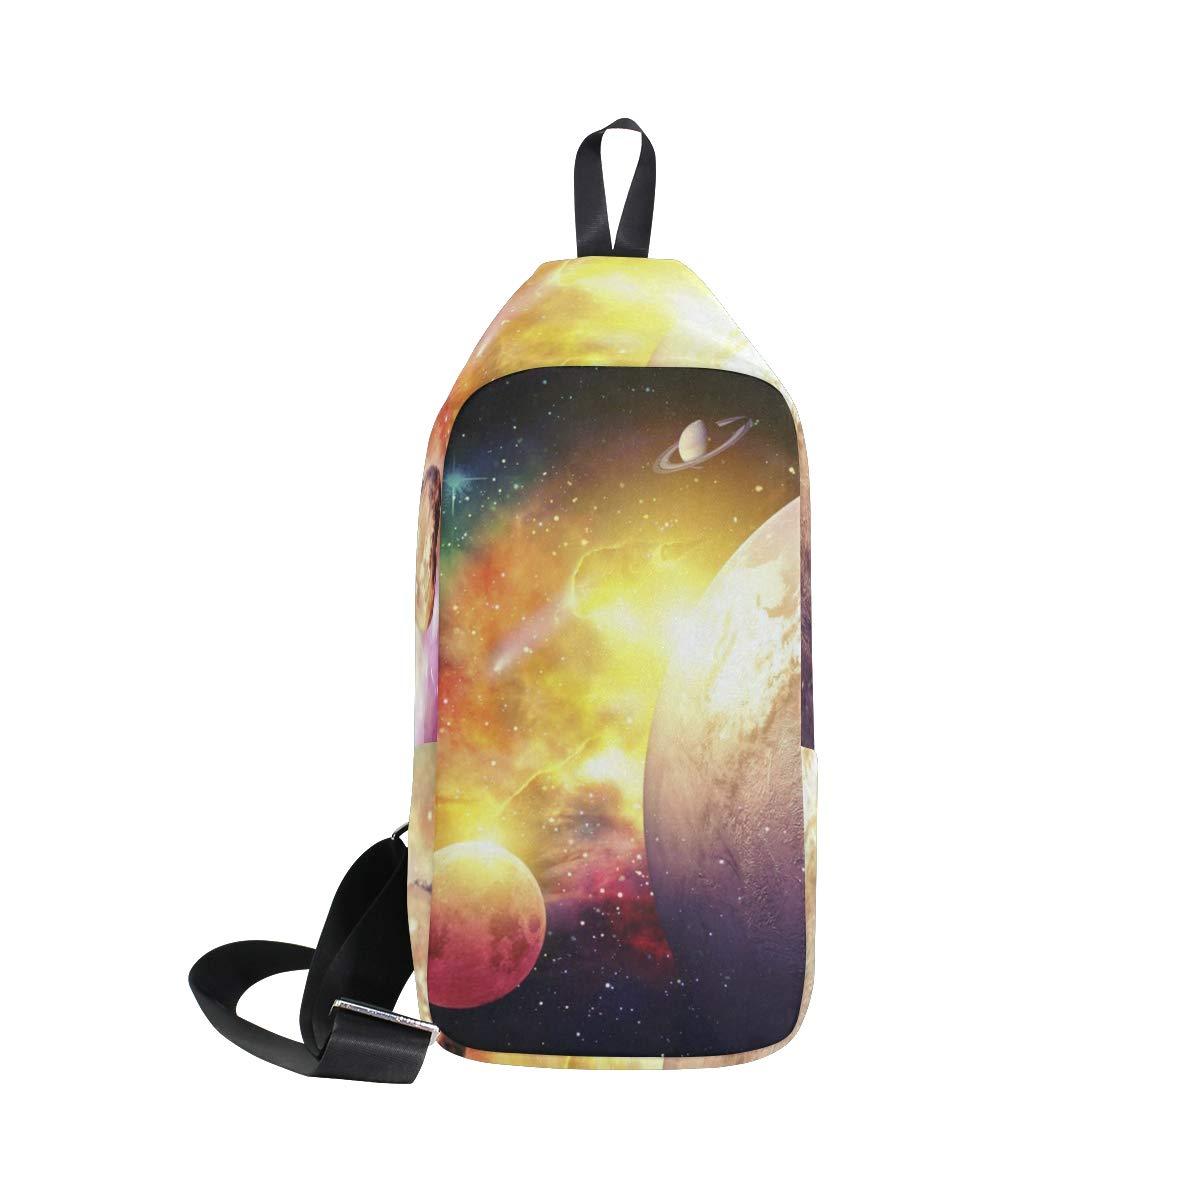 Lovexue Sling Bag Blue and Red Fire Mens Chest Shoulder Backpacks Crossbody One Strap Daypack